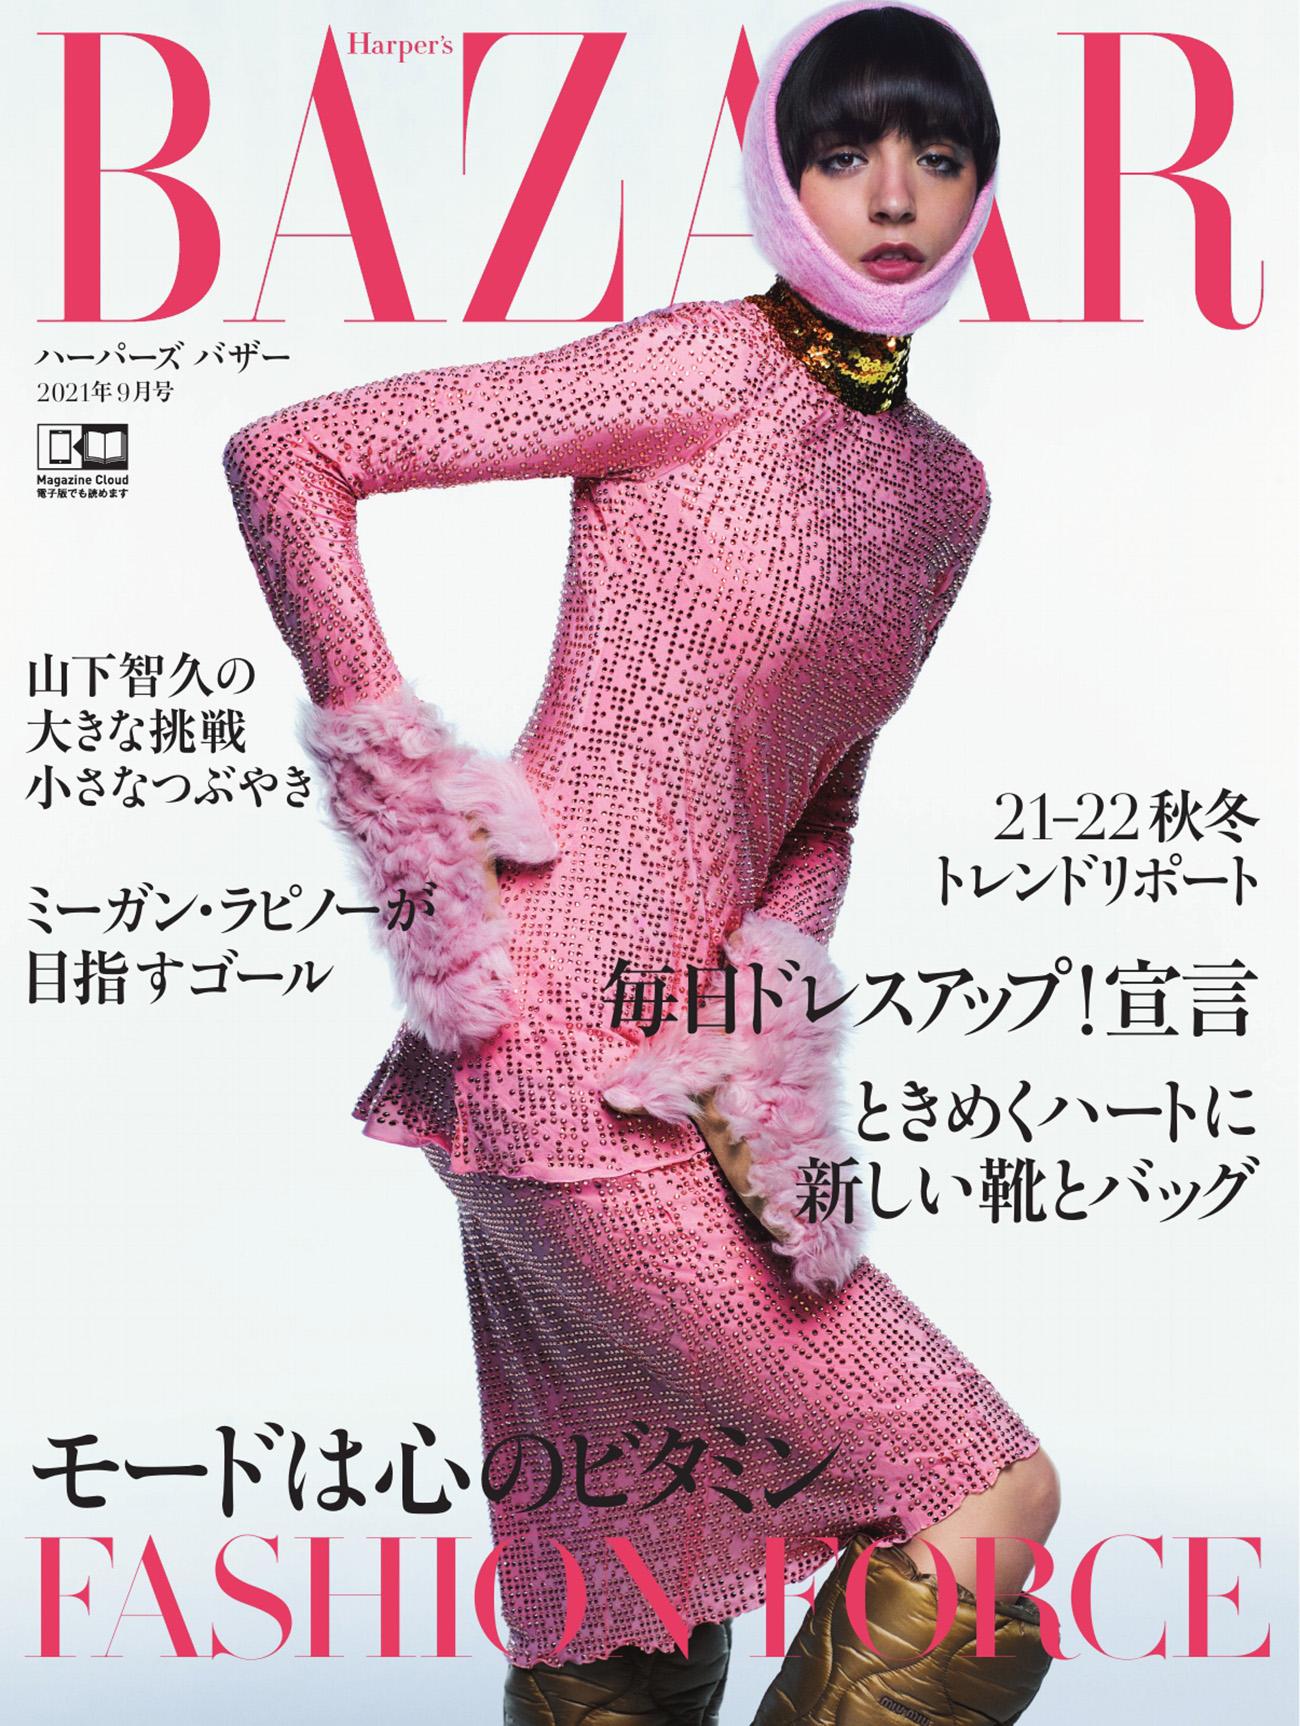 Marisa Shea covers Harper's Bazaar Japan September 2021 by Yusuke Miyazaki